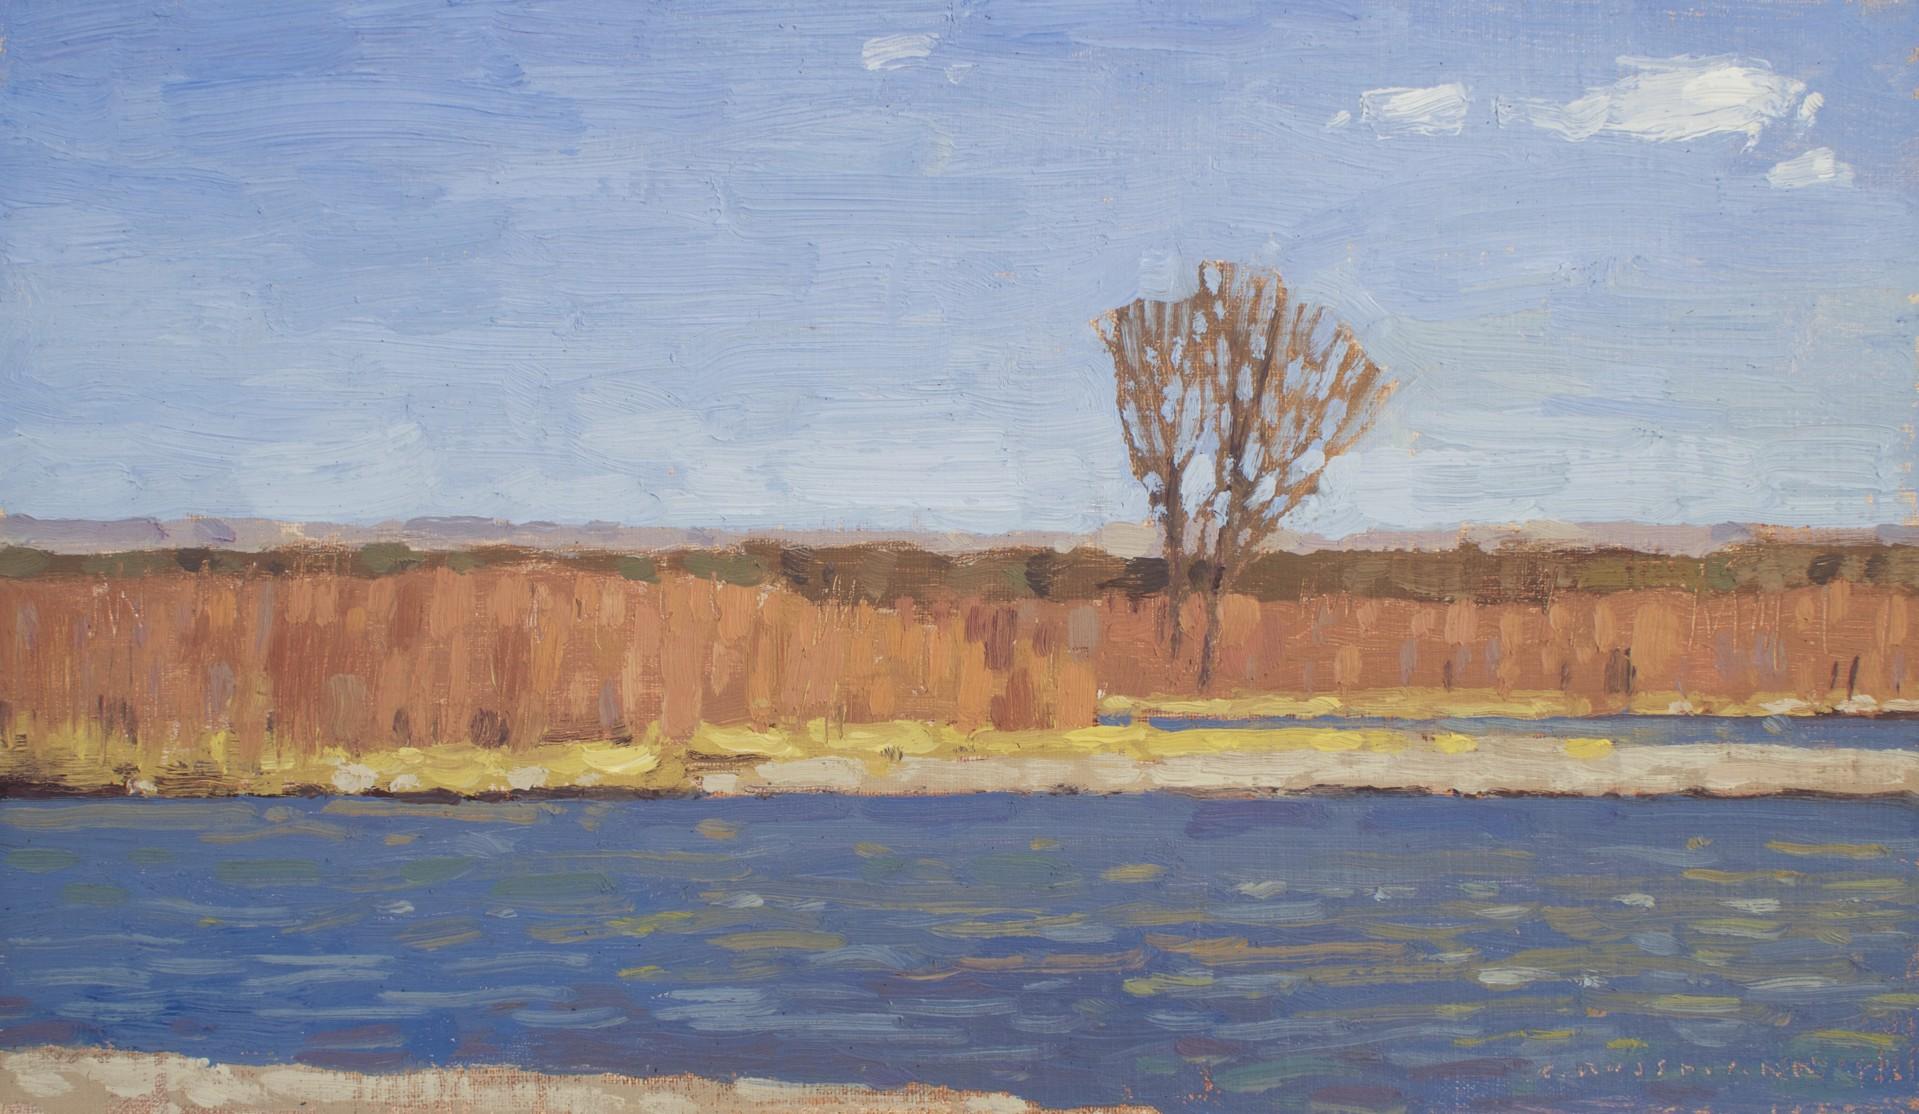 Colorado River Flow by David Grossmann